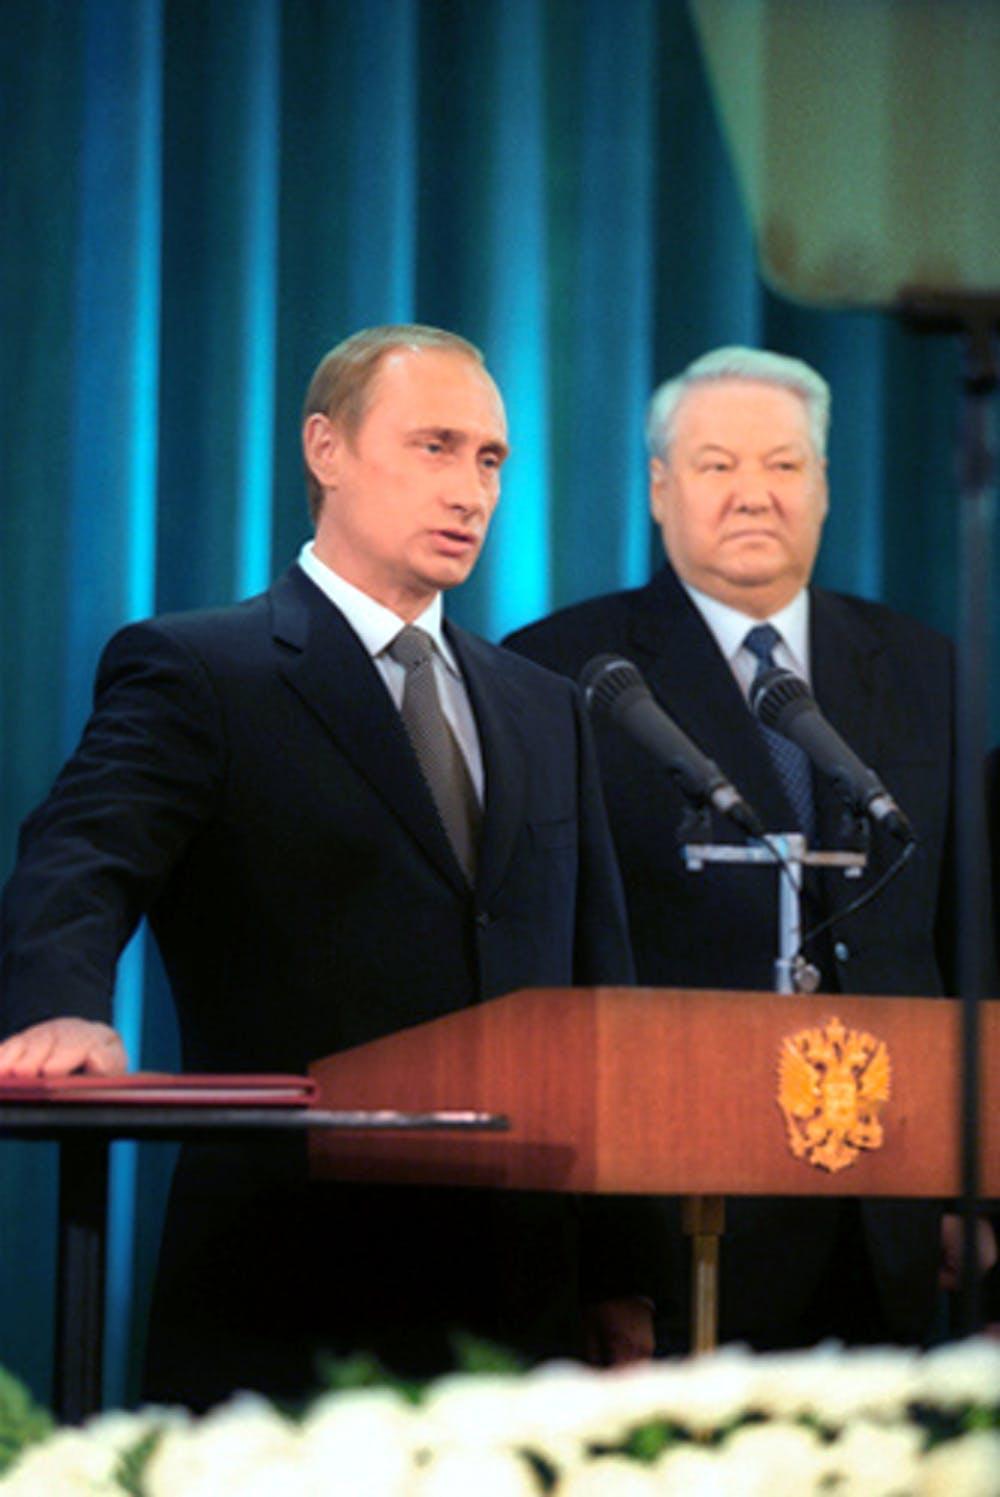 Vladimir Putin prestando juramento como presidente de Rusia junto a Boris Yeltsin el 7 de mayo de 2000. Kremlin.ru, CC BY